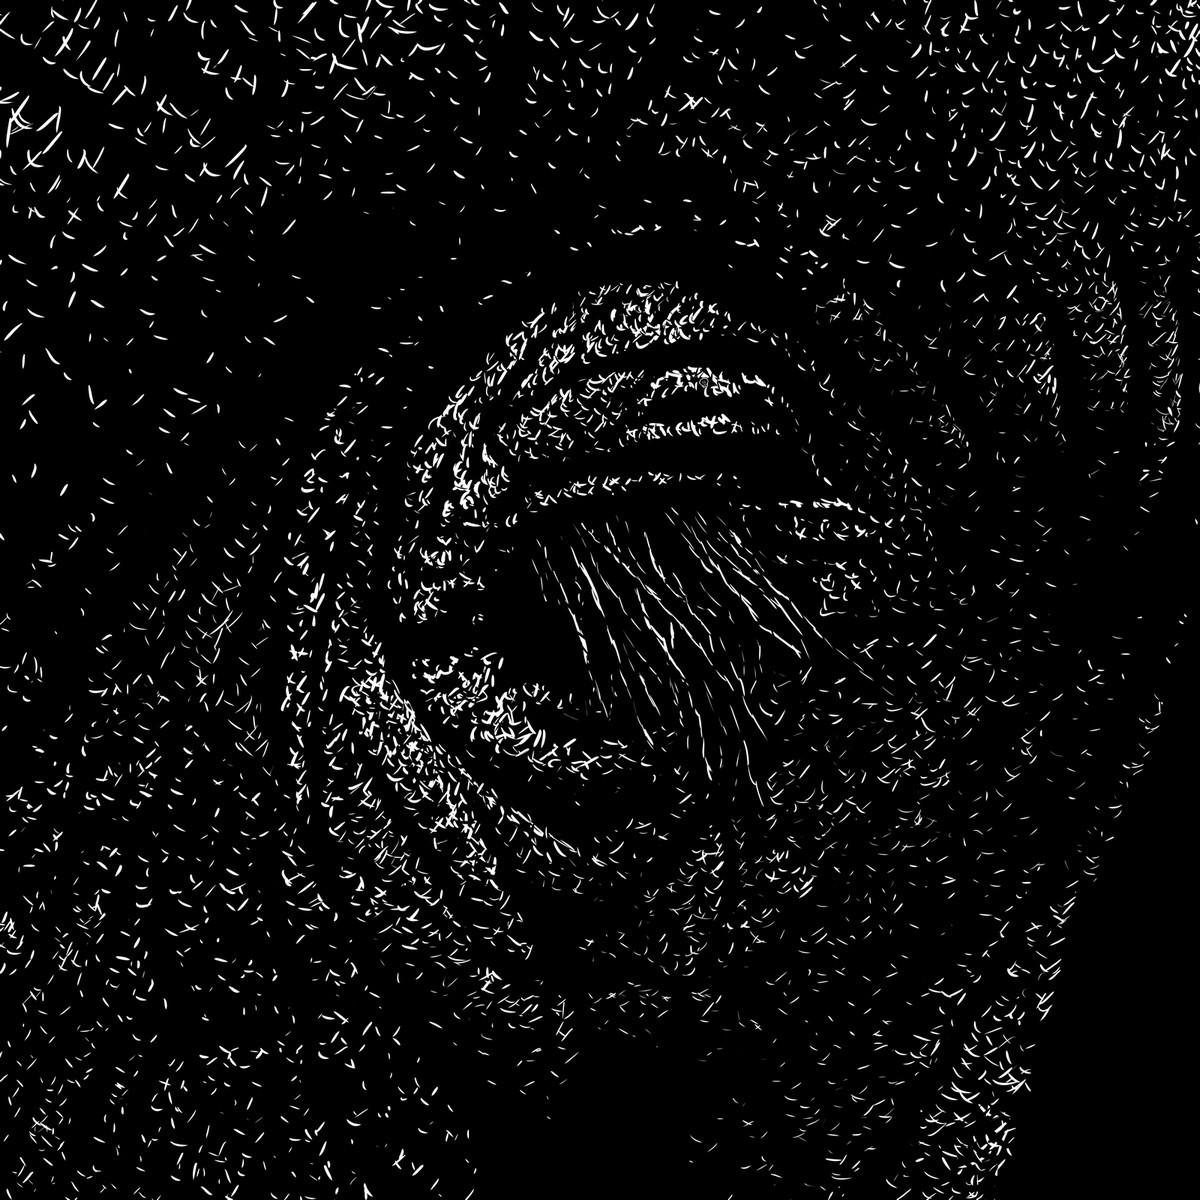 elephantidae, close-up Digital scratchboard, dec. 2018